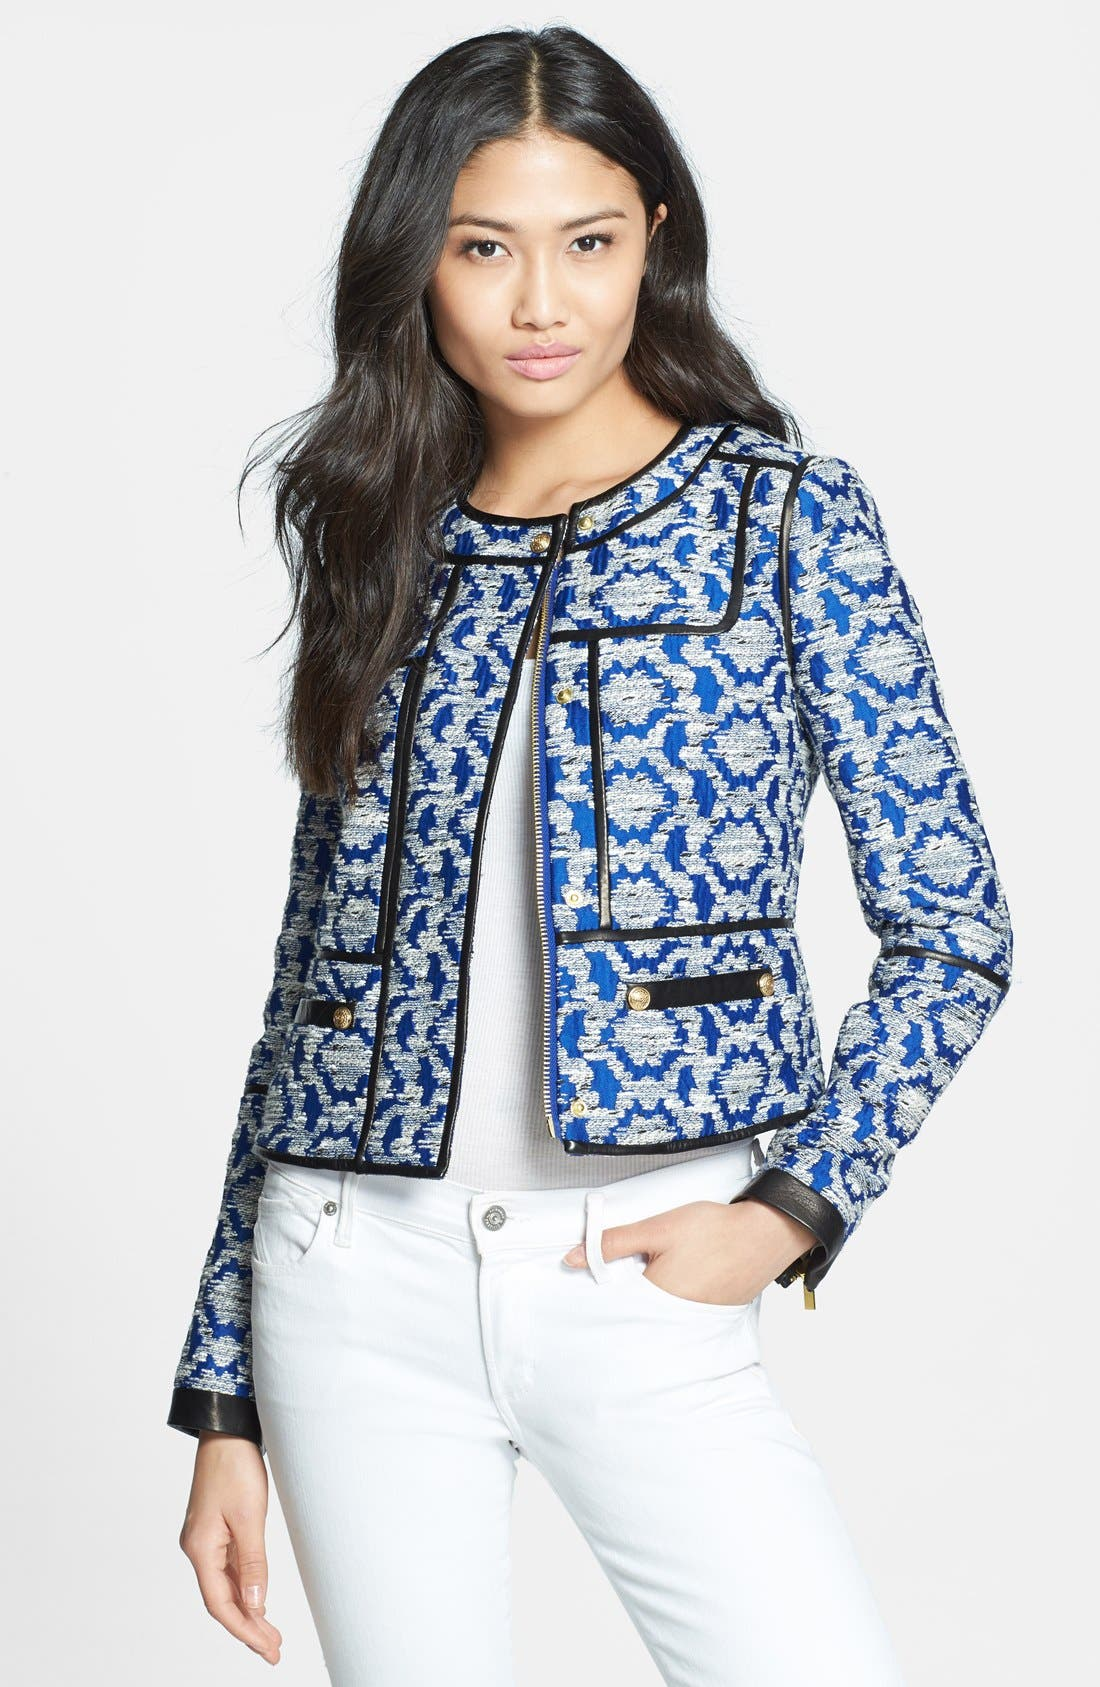 Alternate Image 1 Selected - Diane von Furstenberg 'Maelee' Crop Jacquard Jacket